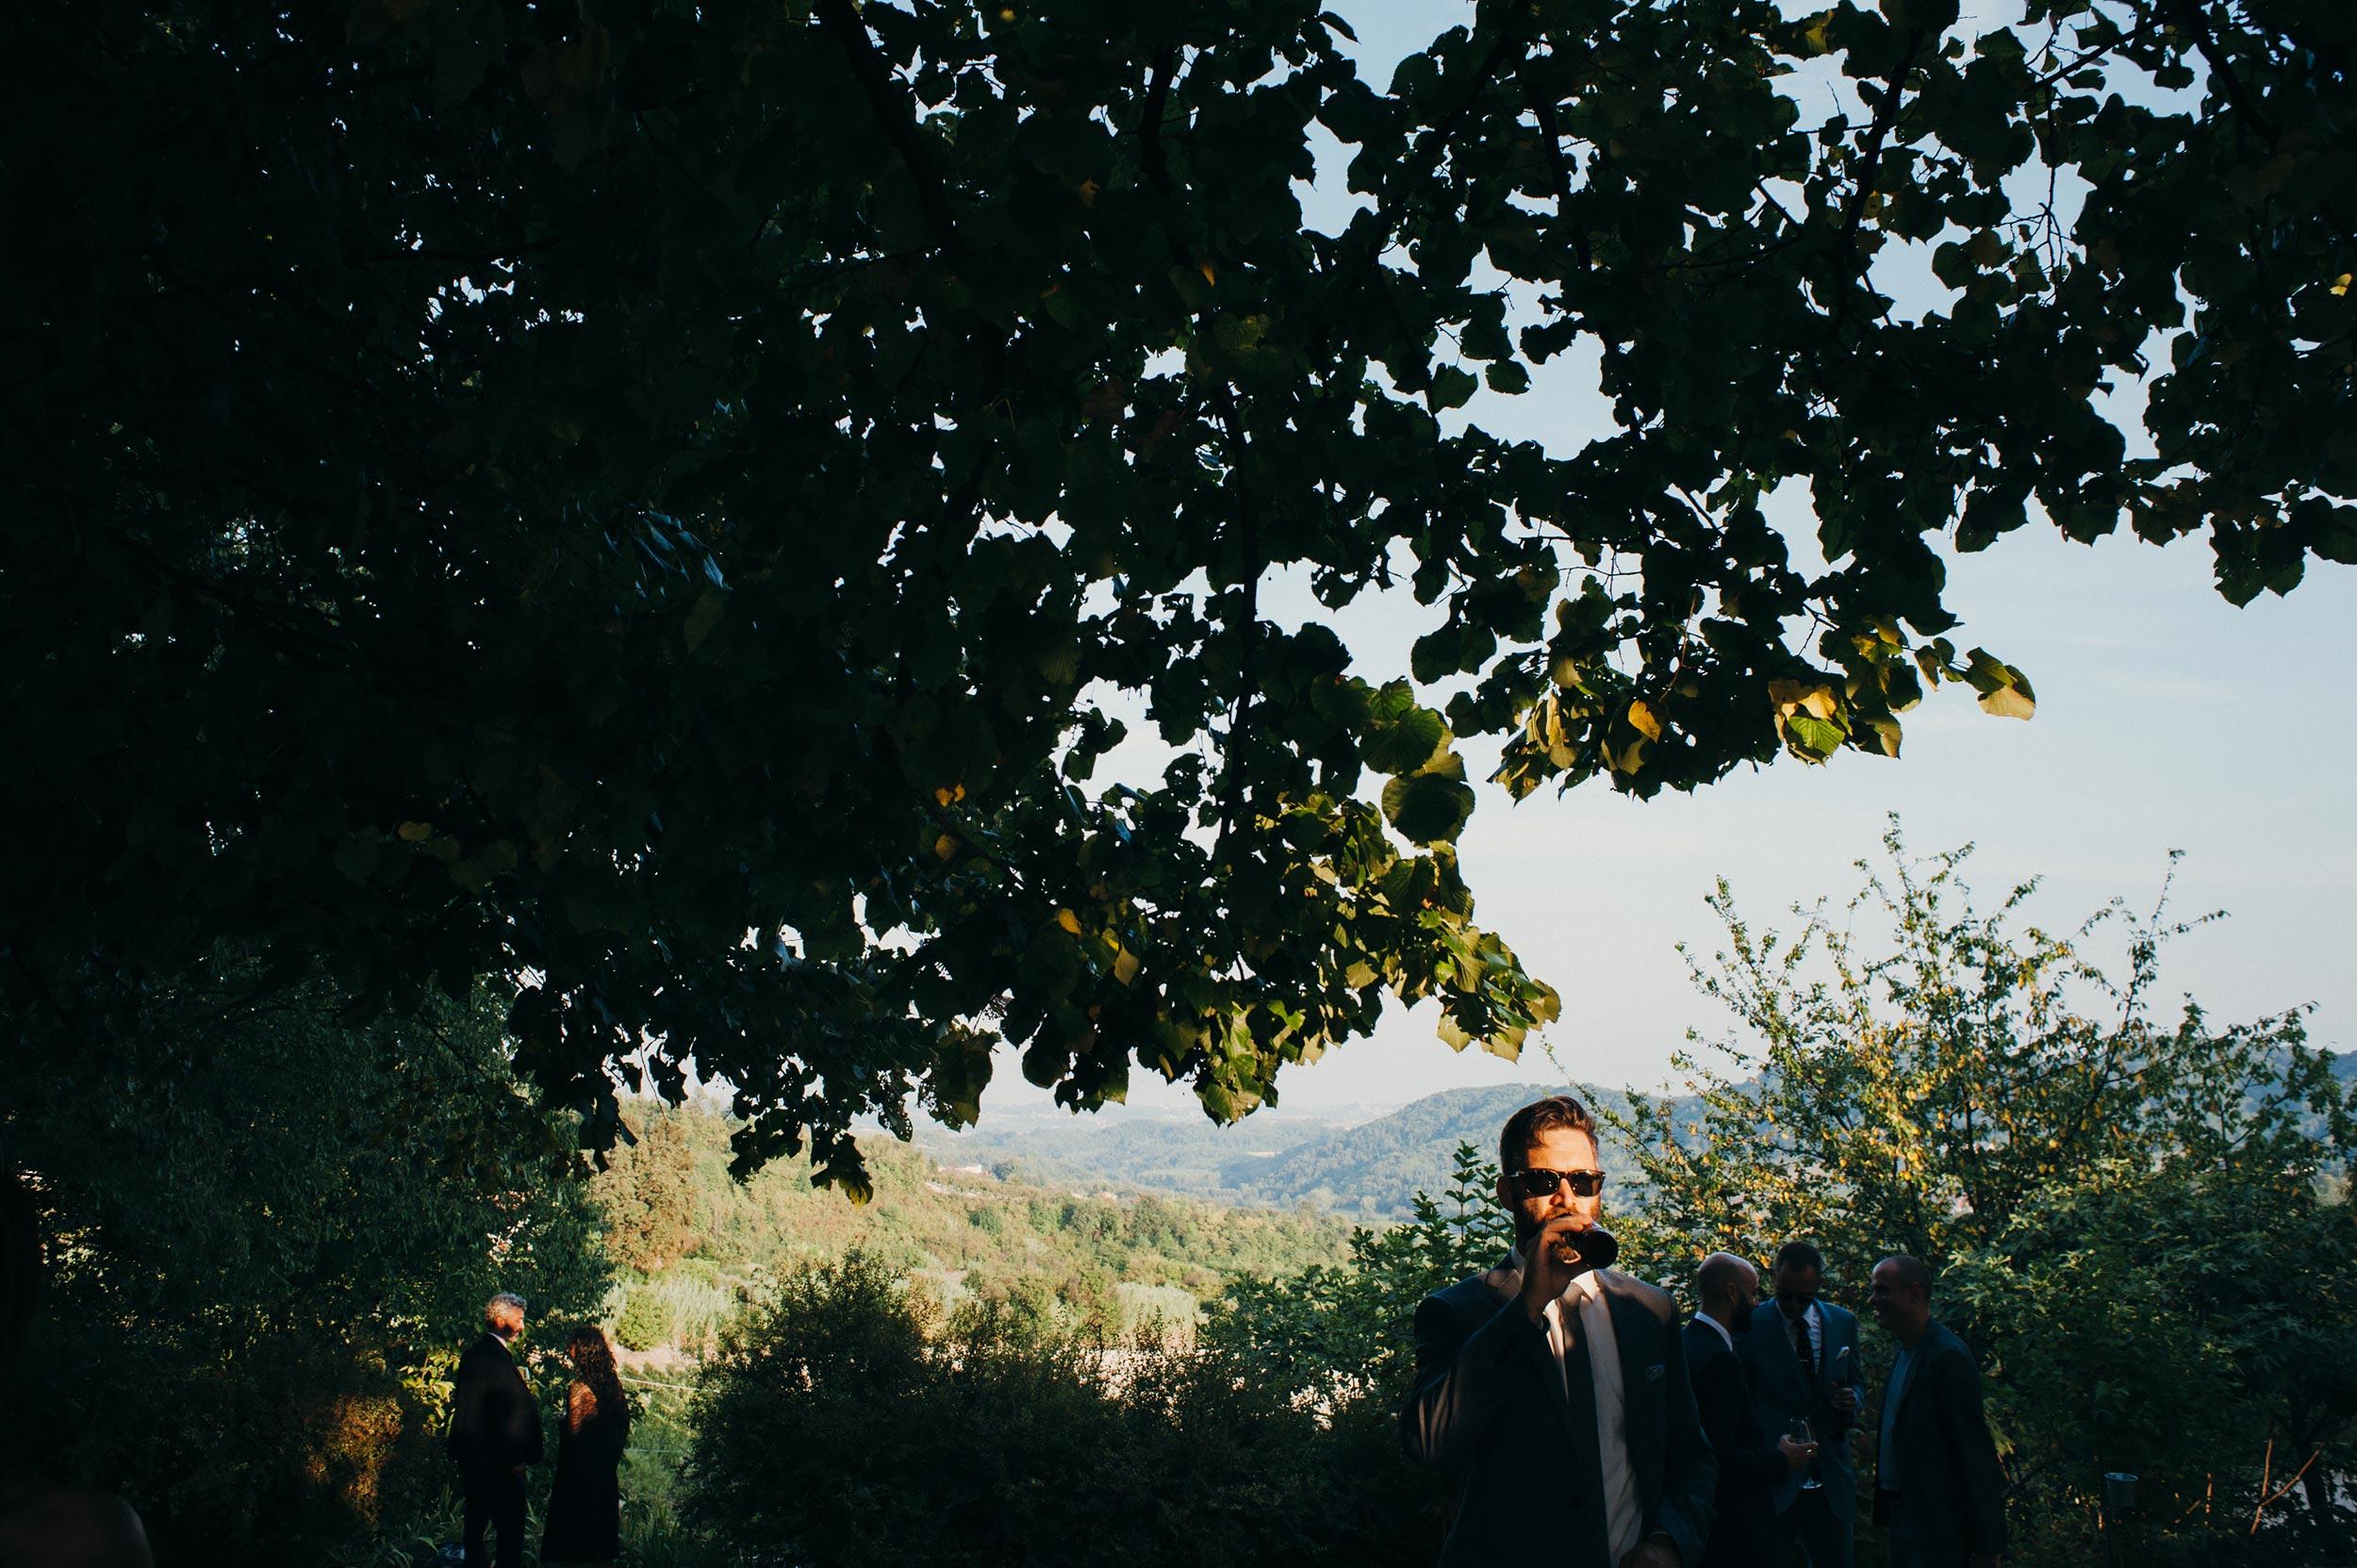 2016-Davor-Chiara-Monferrato-Asti-Vercelli-Wedding-Photographer-Italy-Alessandro-Avenali-53.jpg